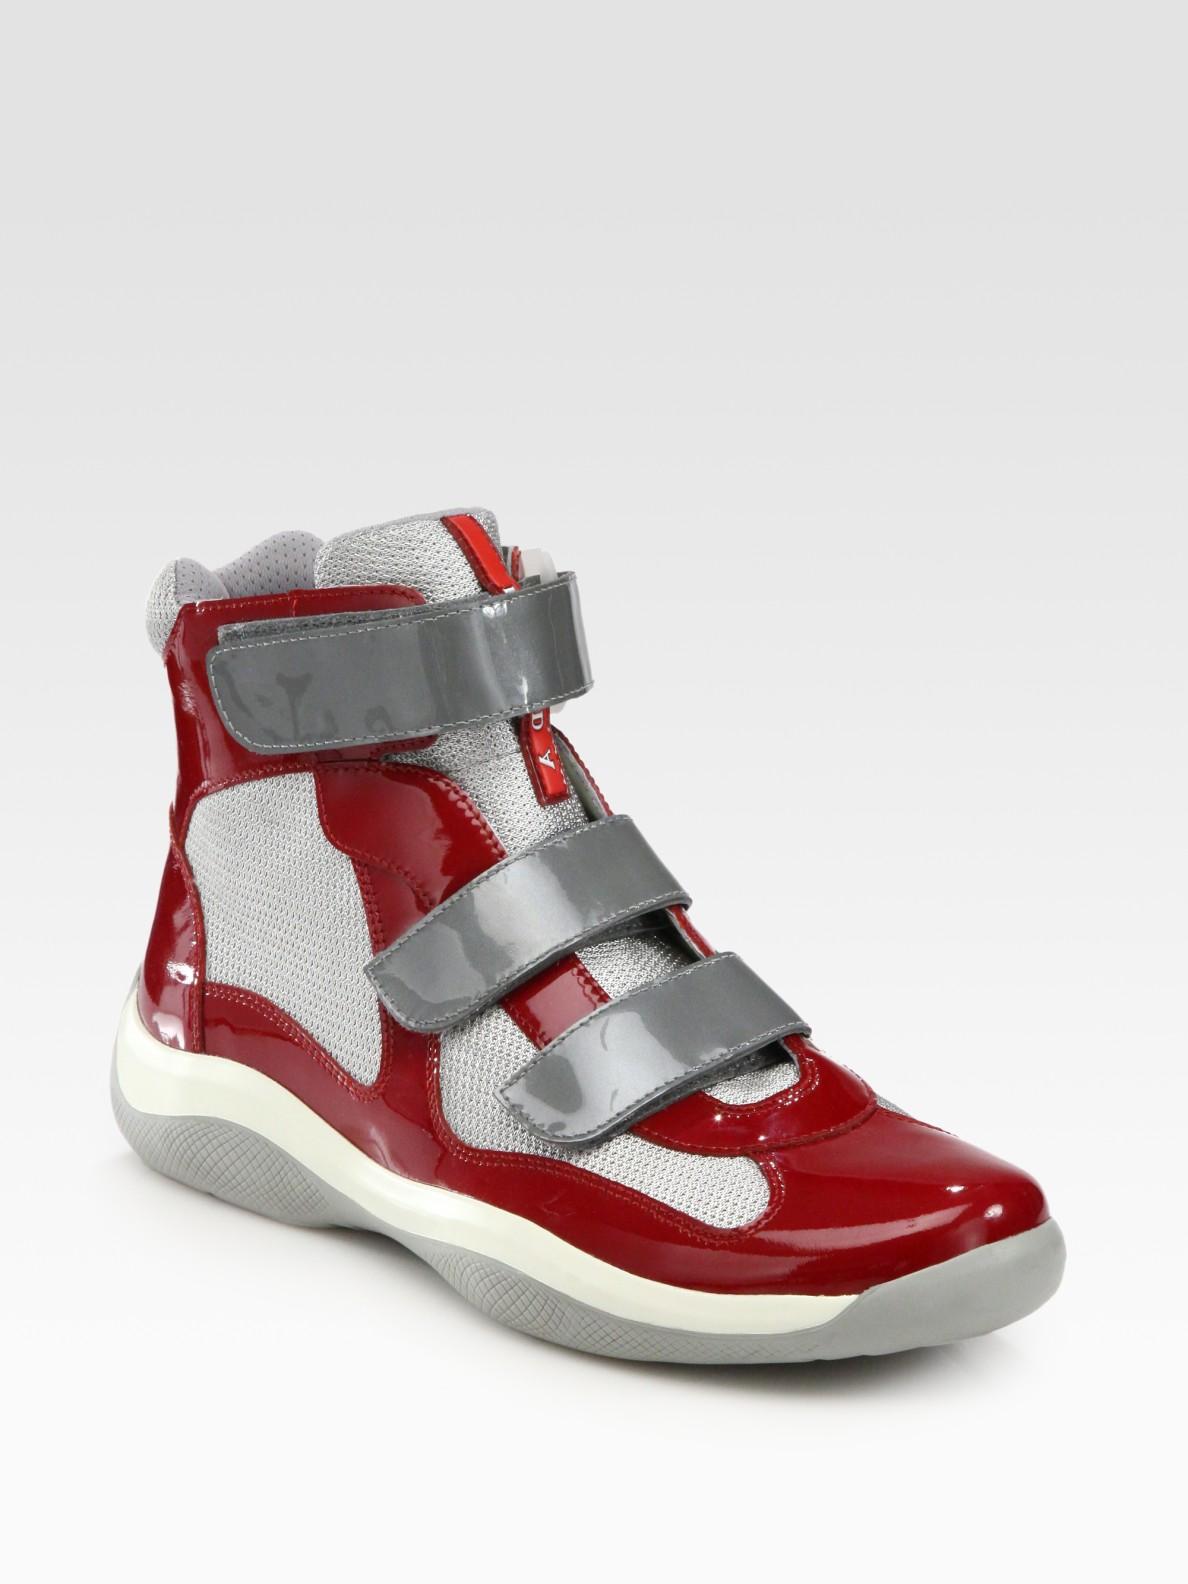 f5c55b5fd4e7 2e29d 14fdb  discount code for lyst prada high top sport sneakers in red  for men 249b5 503d1